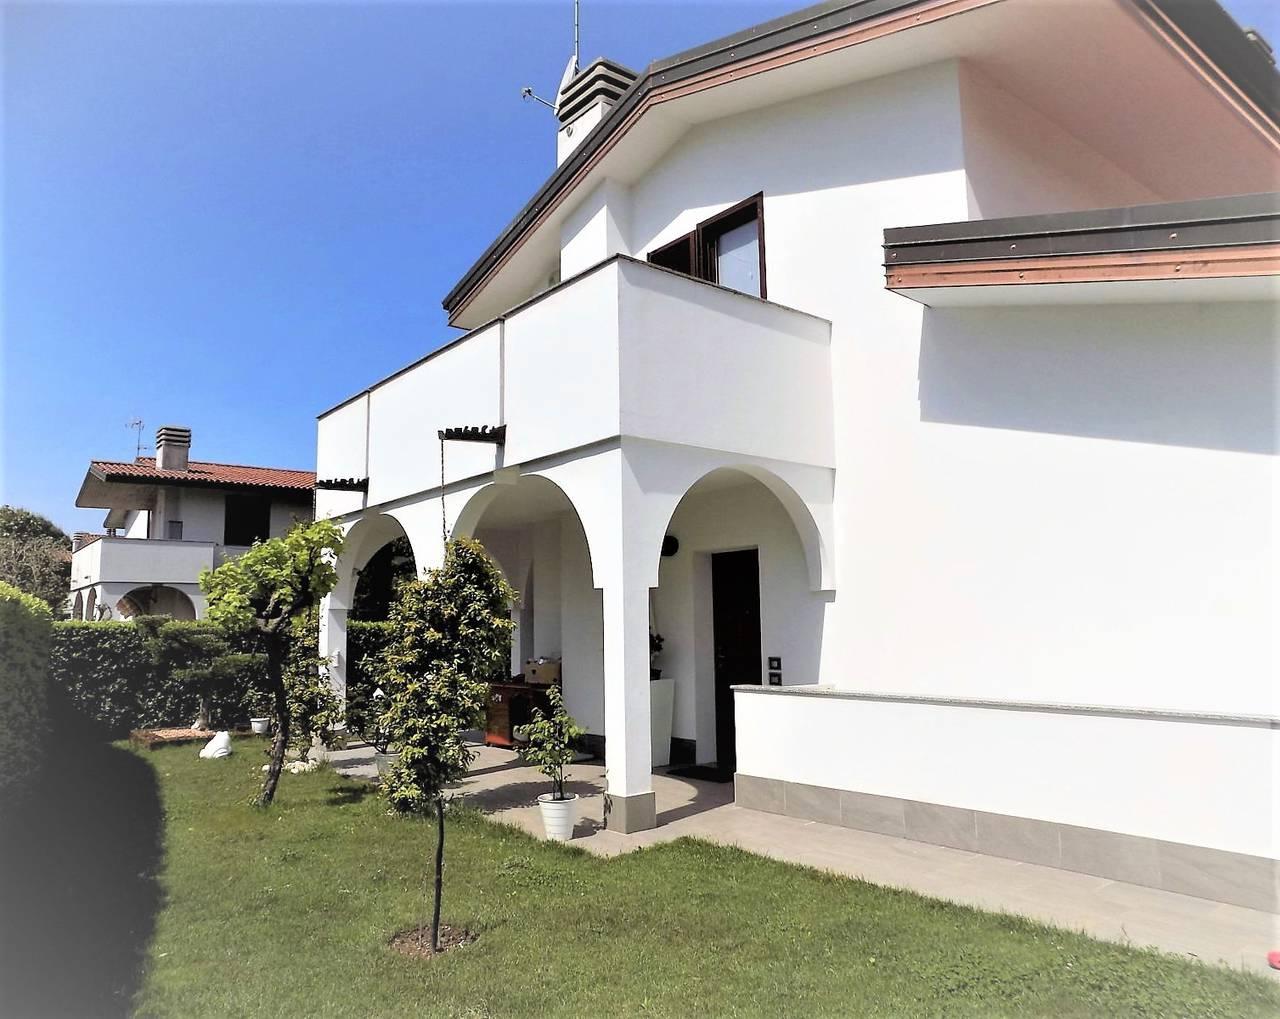 Porzione-villa-bifamigliare-ristrutturata-in-vendita-a-Carnate-26